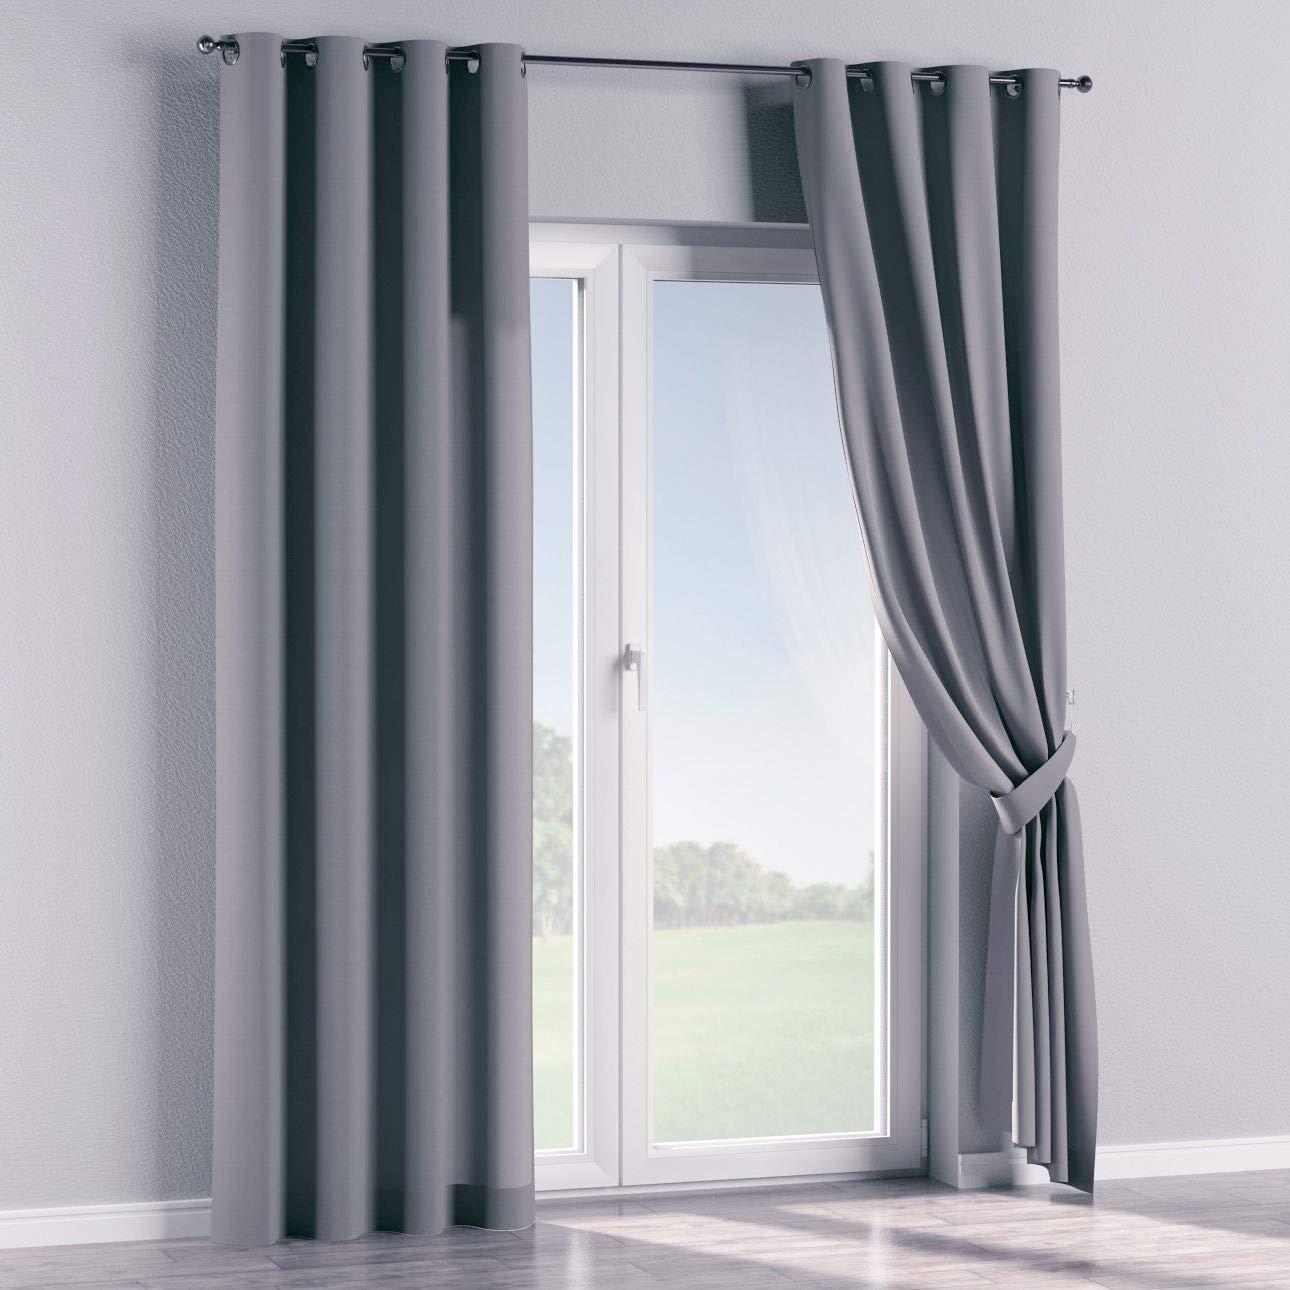 Dekoria Ösenschal Dekoschal Blickdicht 1 Stck. 130 × 260 cm Slade Grey Maßanfertigung möglich